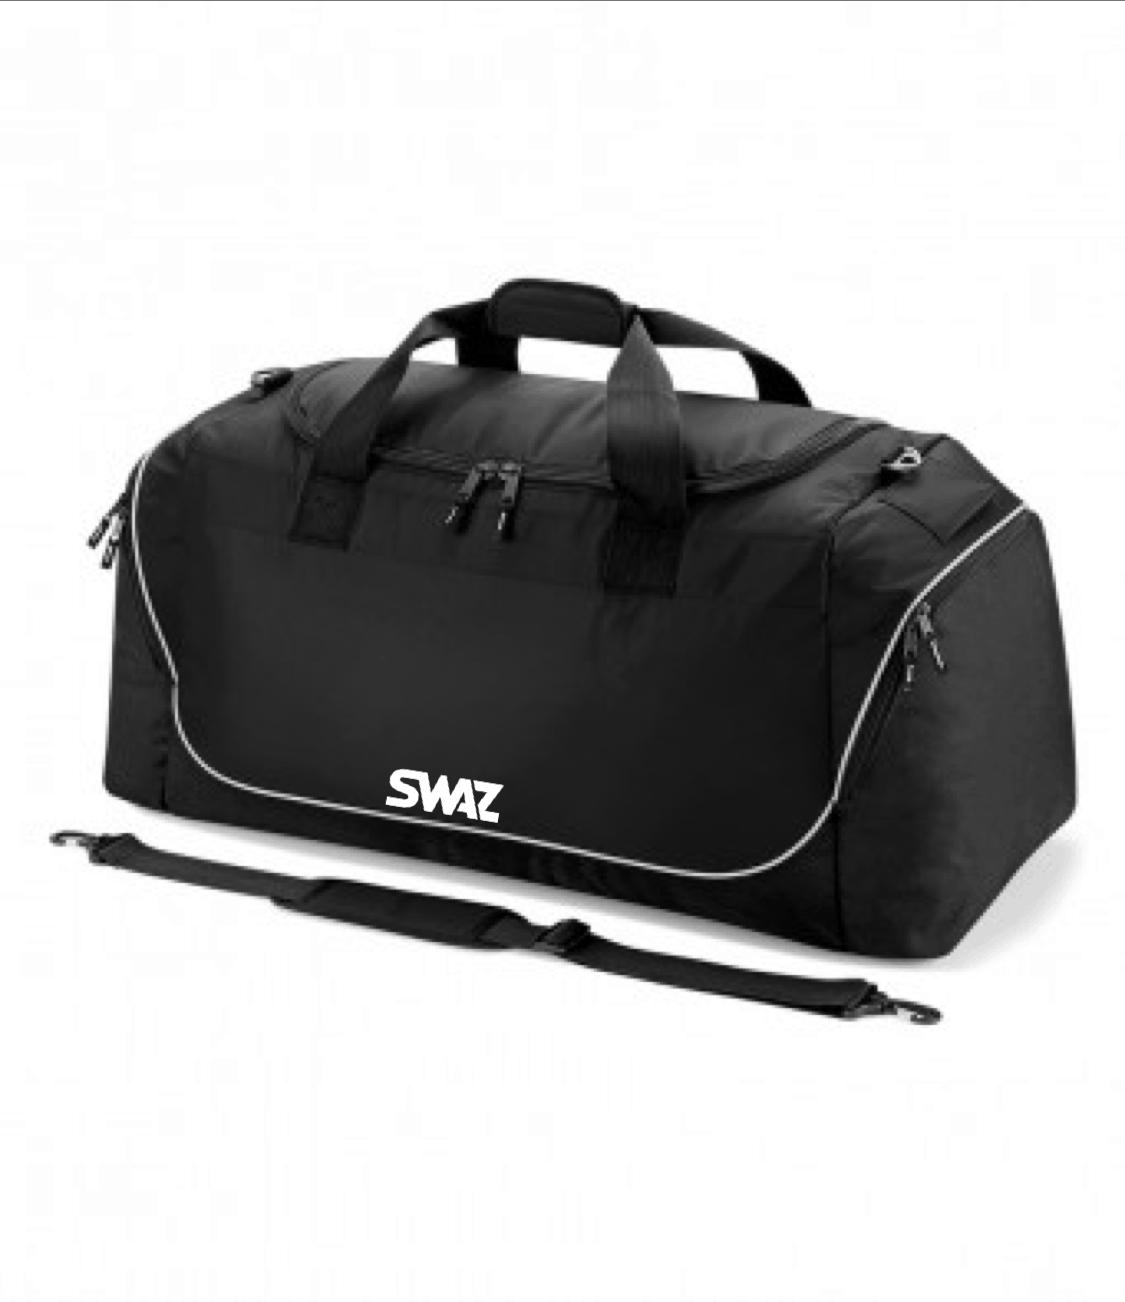 Football Bag   SWAZ   Football Training Kit and Teamwear